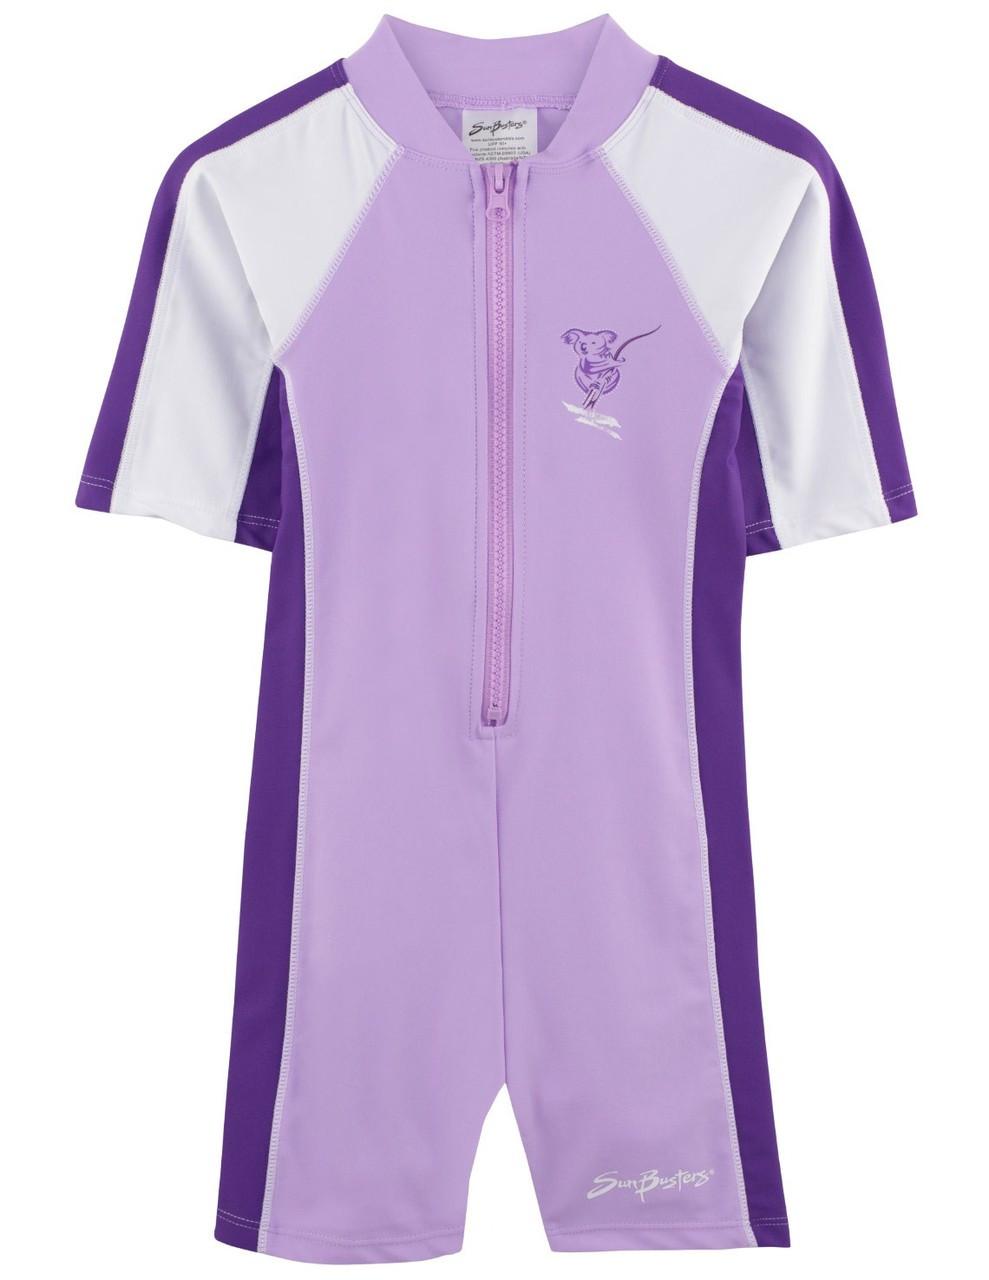 f5d0f385df774 Girls Sun Busters S/S UV 1-Piece Swimsuit Mimosa | Girls UV Swimwear